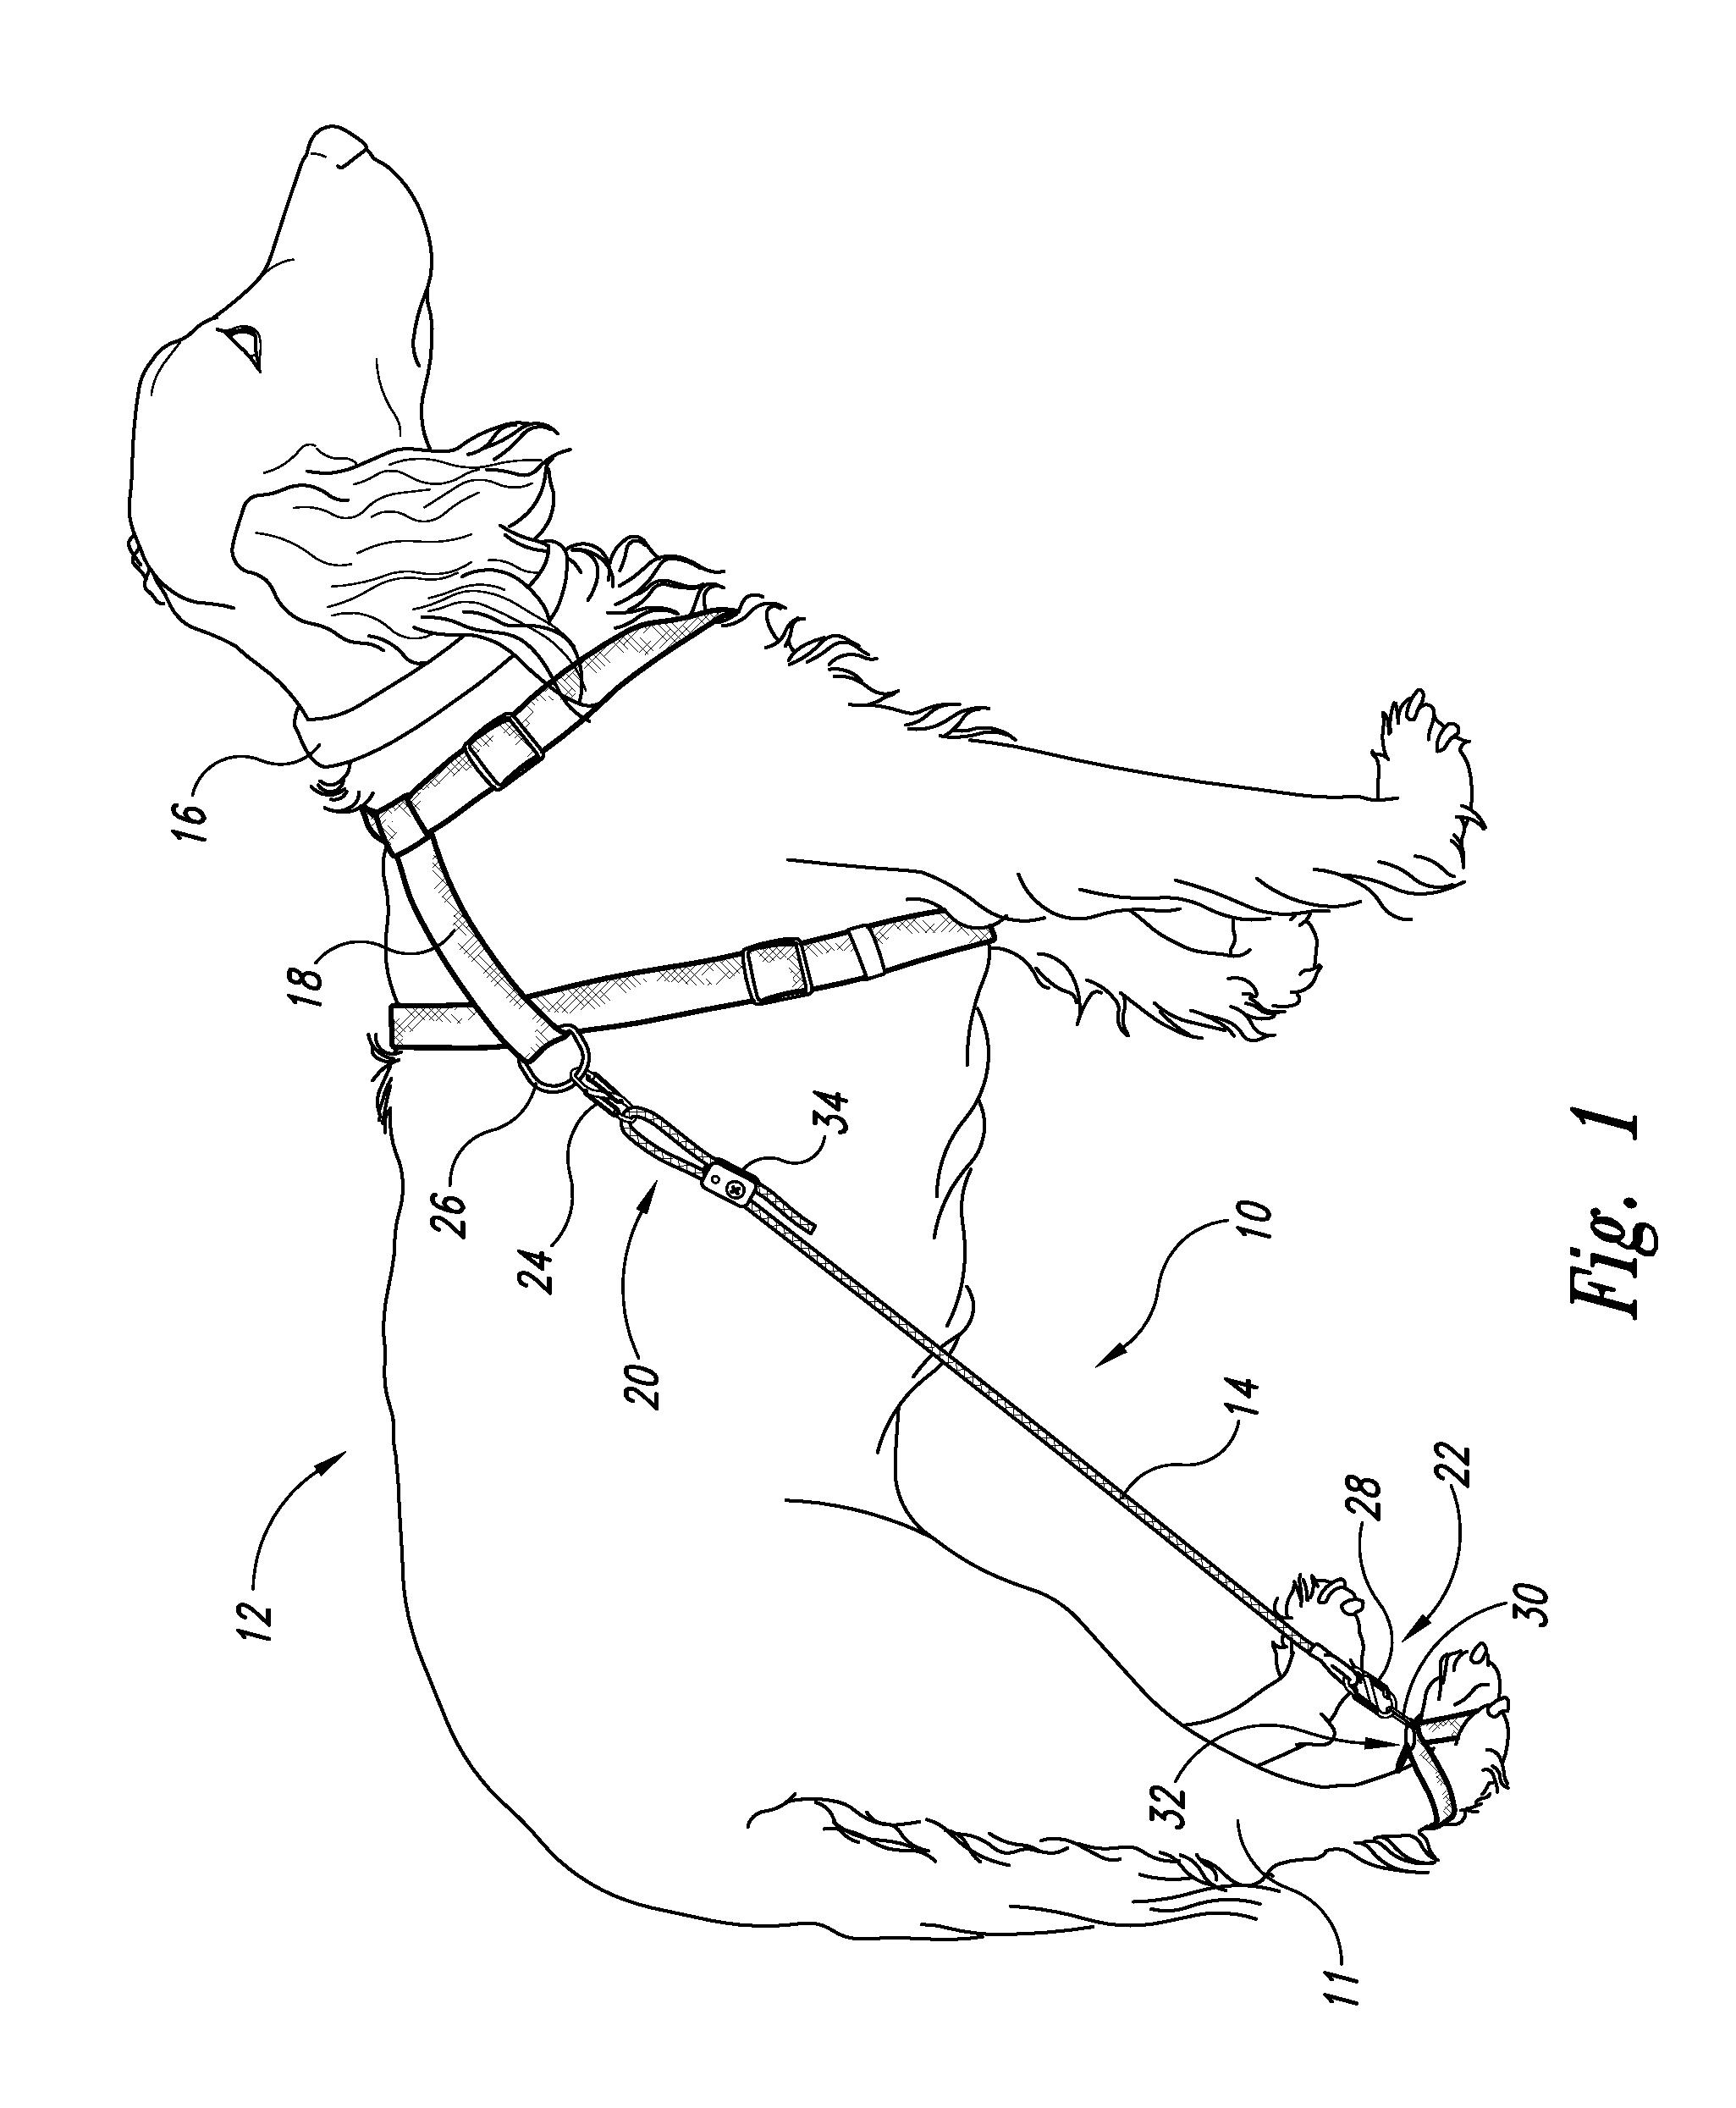 Dog Leg Harness